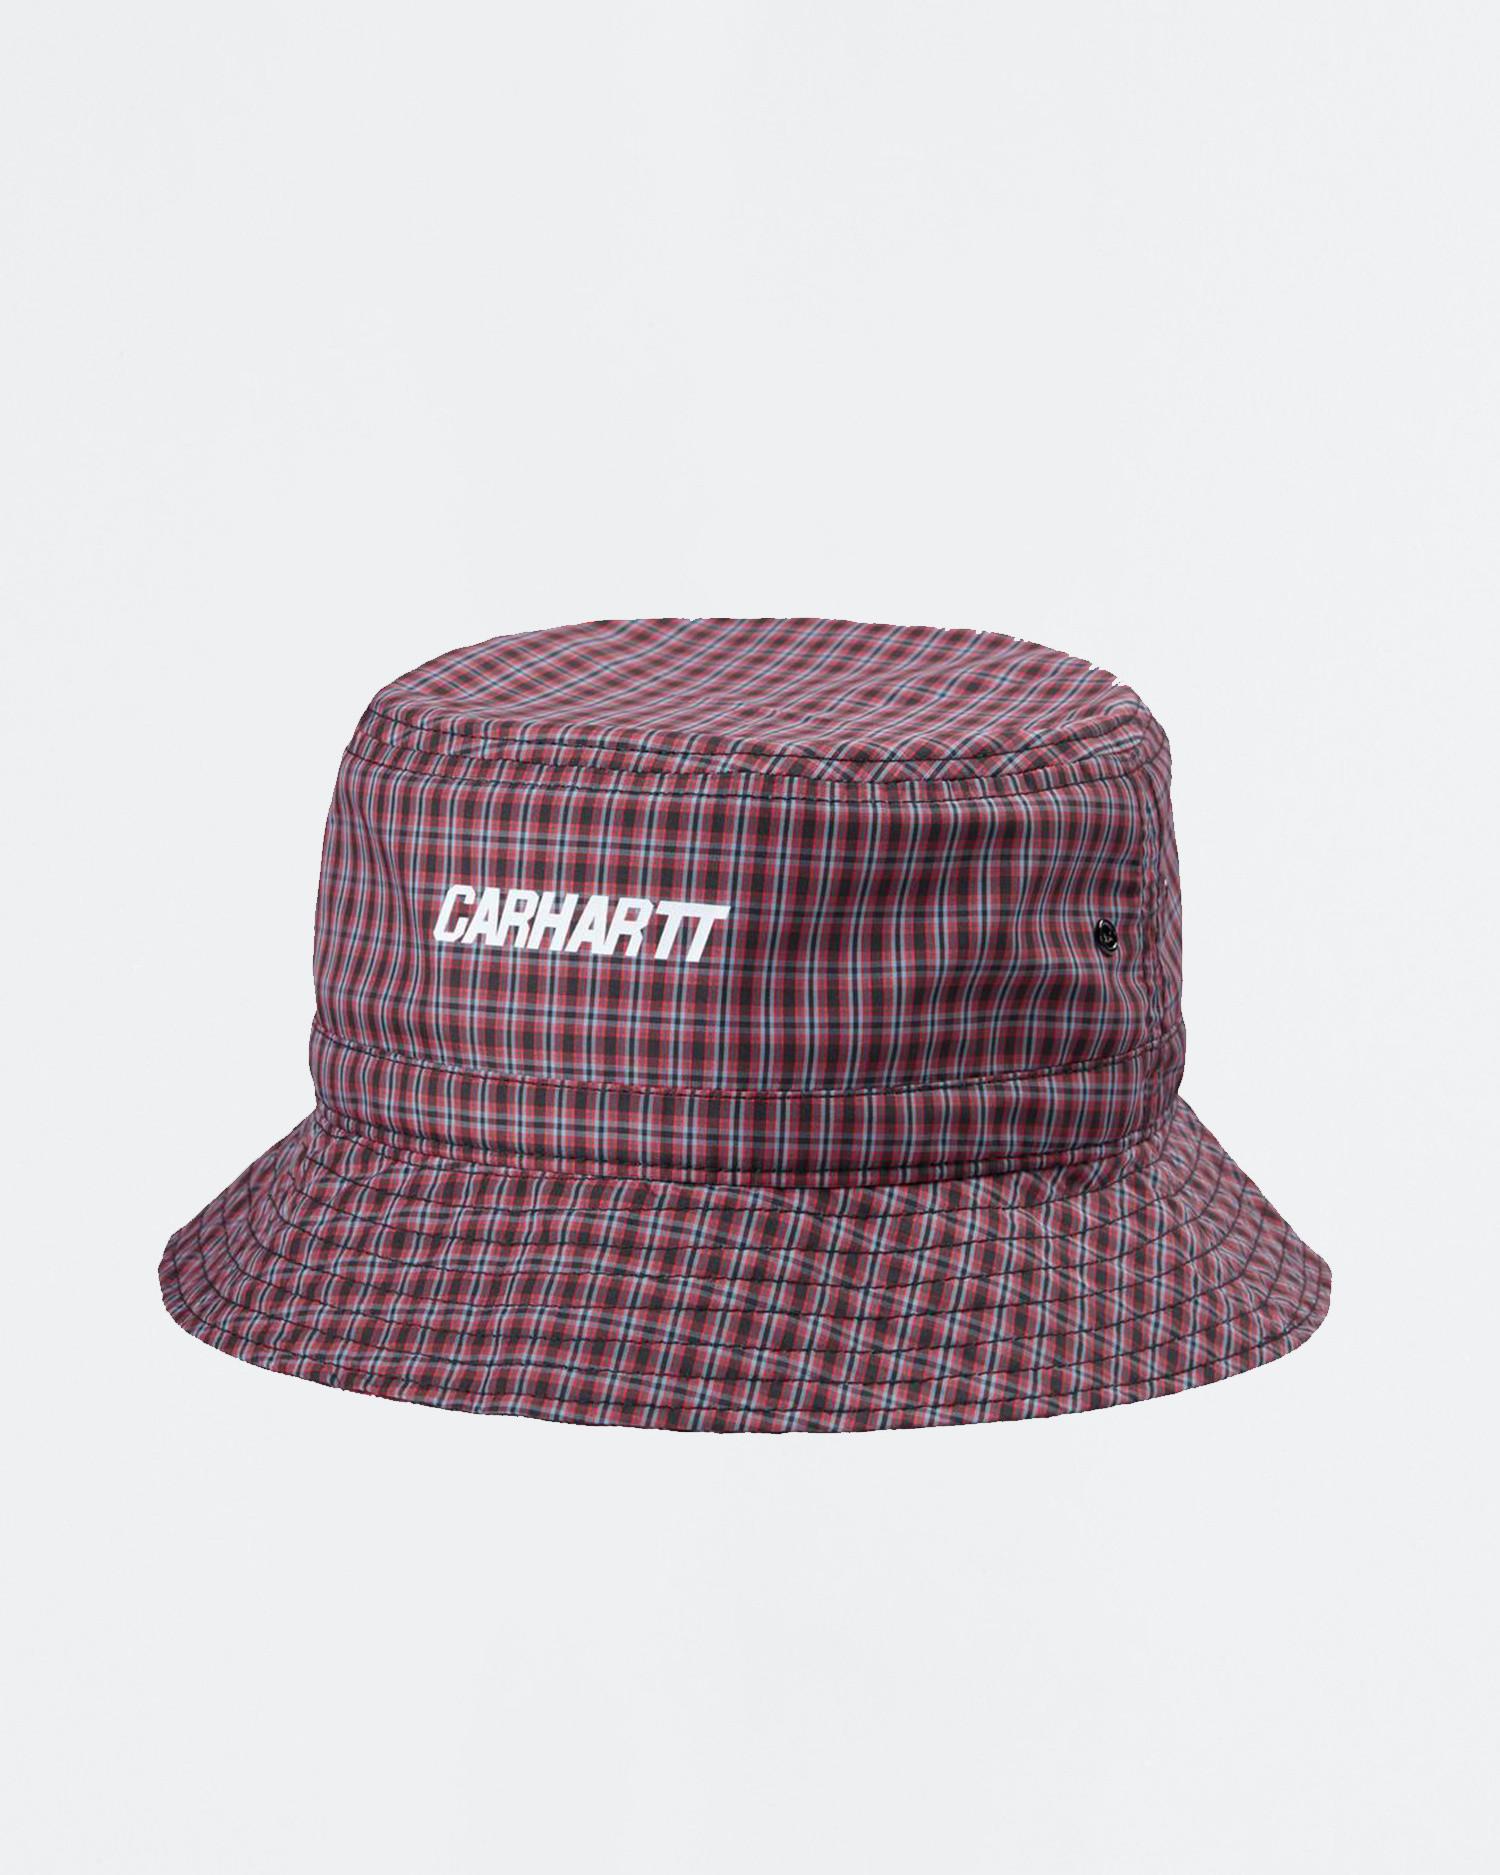 Carhartt Alistair Bucket Hat Black/Etna